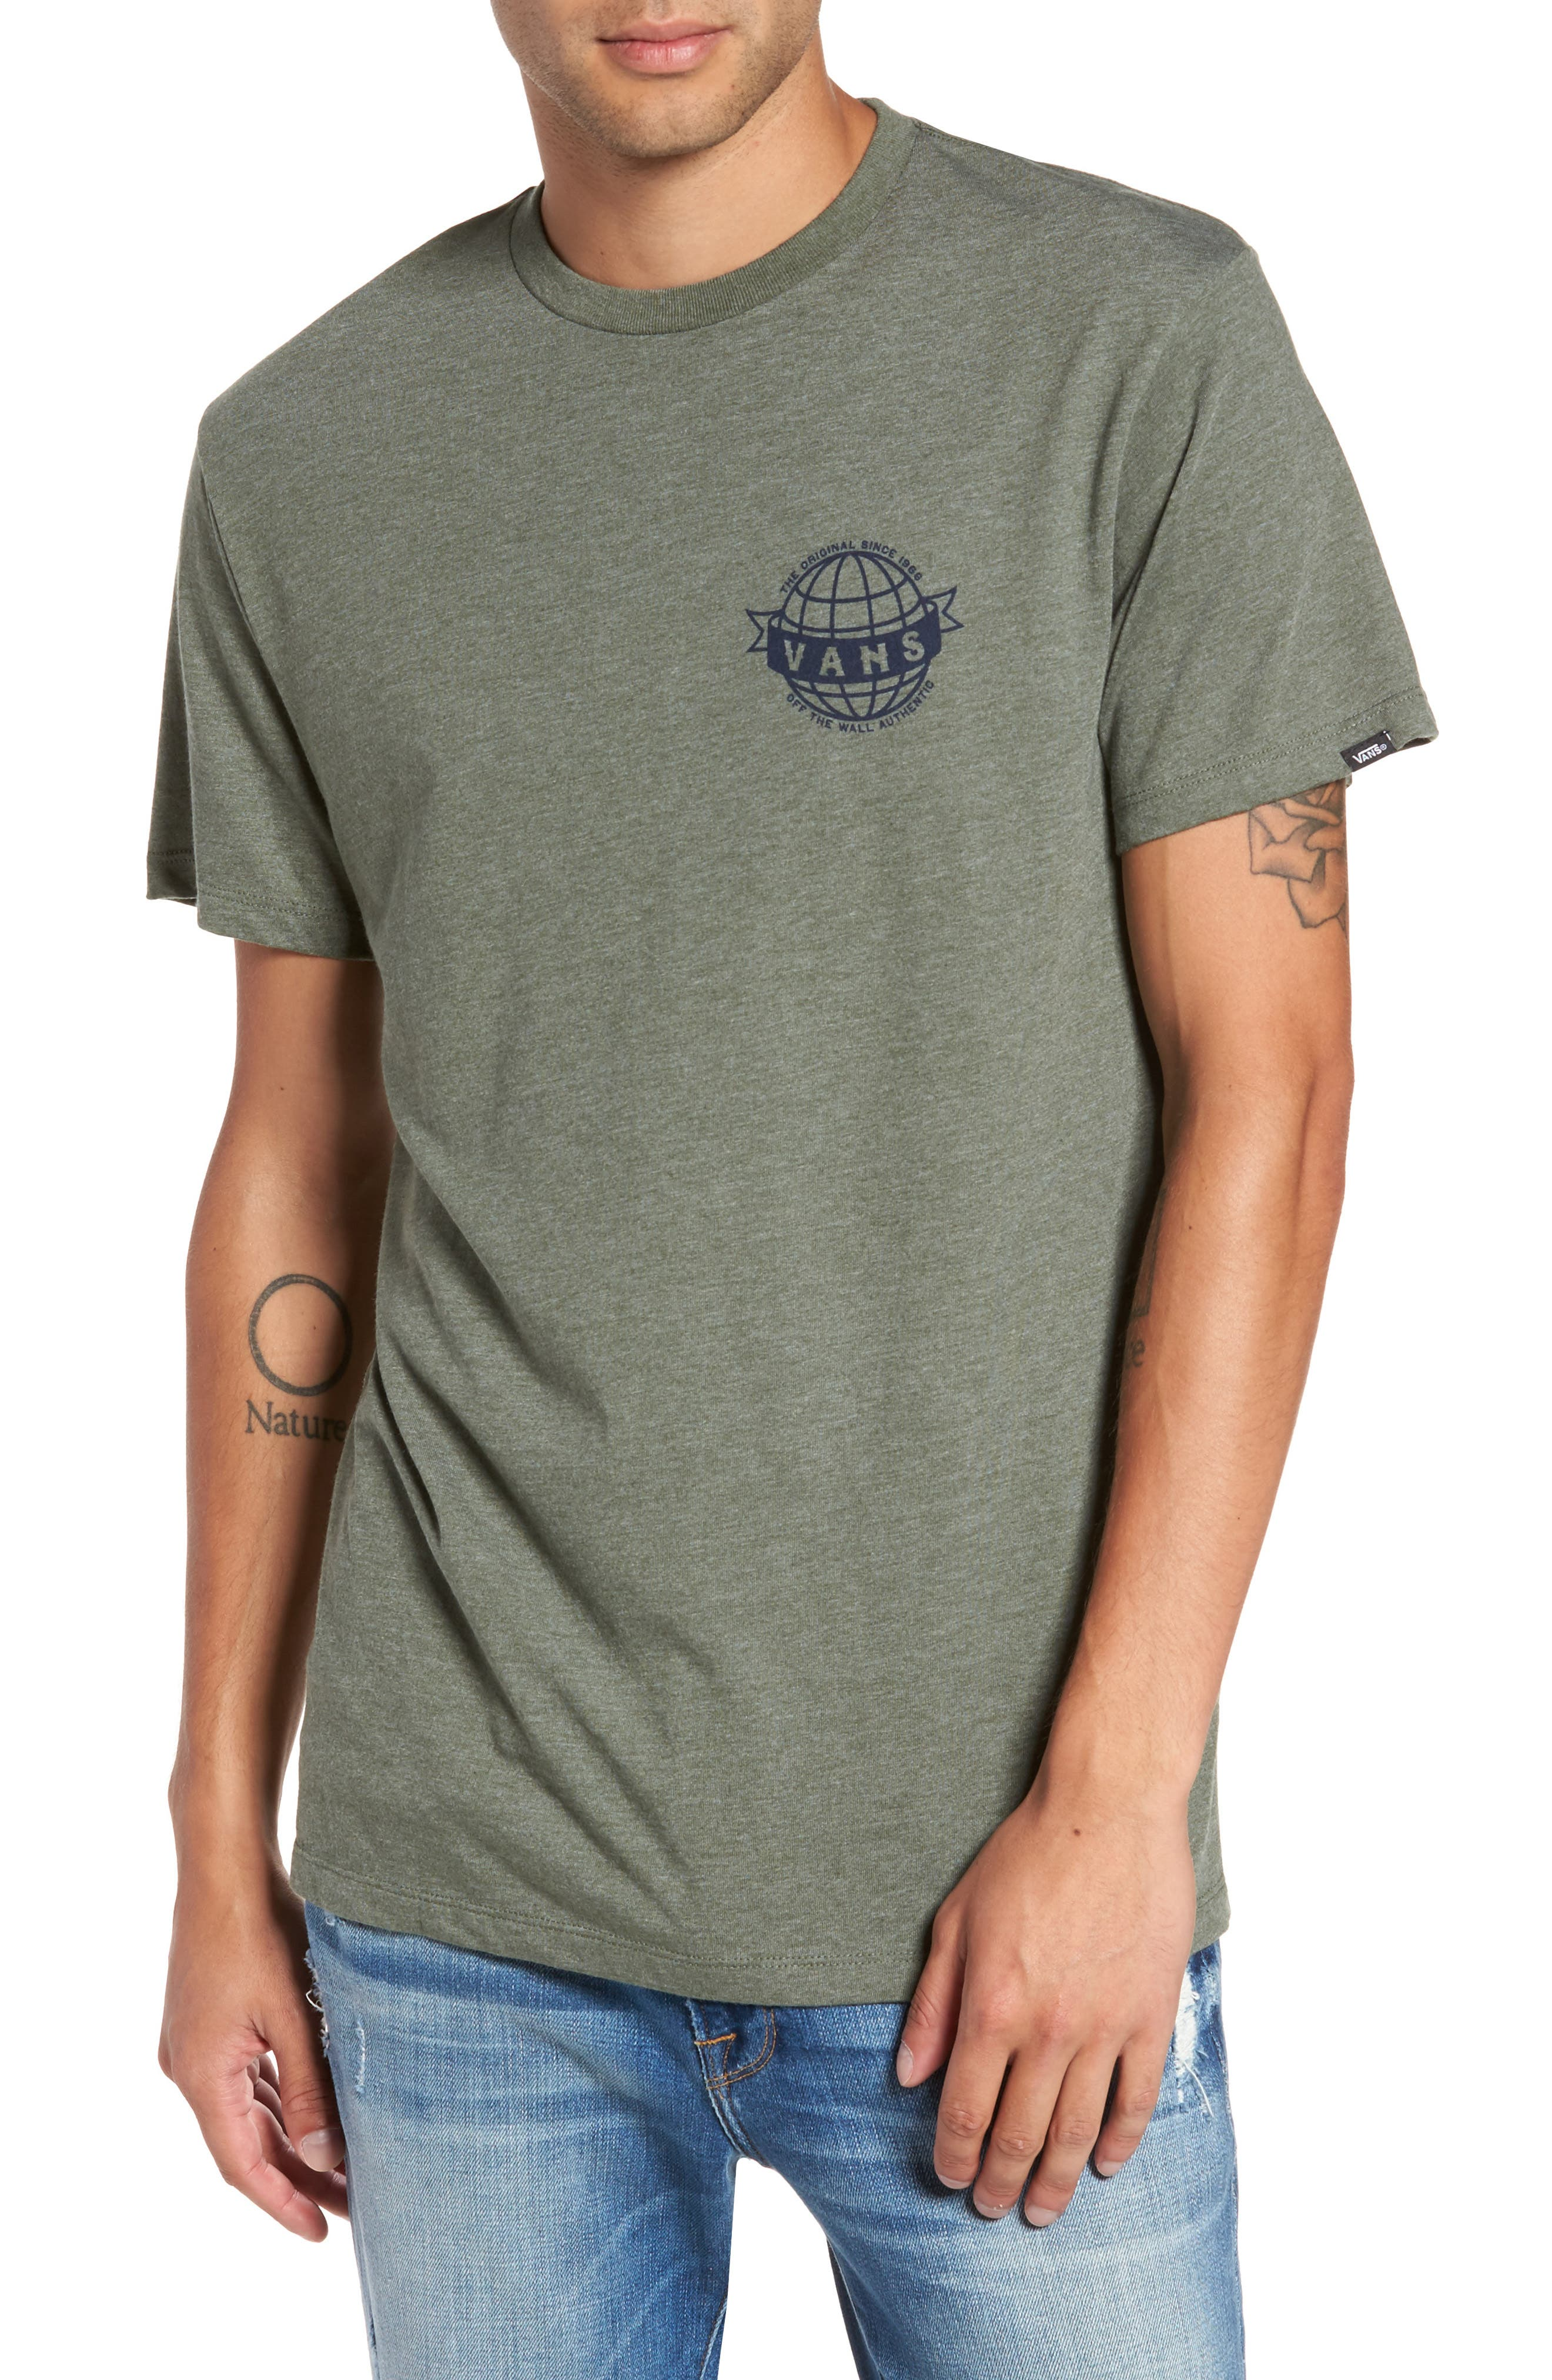 Global Landing Logo Graphic T-Shirt,                             Main thumbnail 1, color,                             301